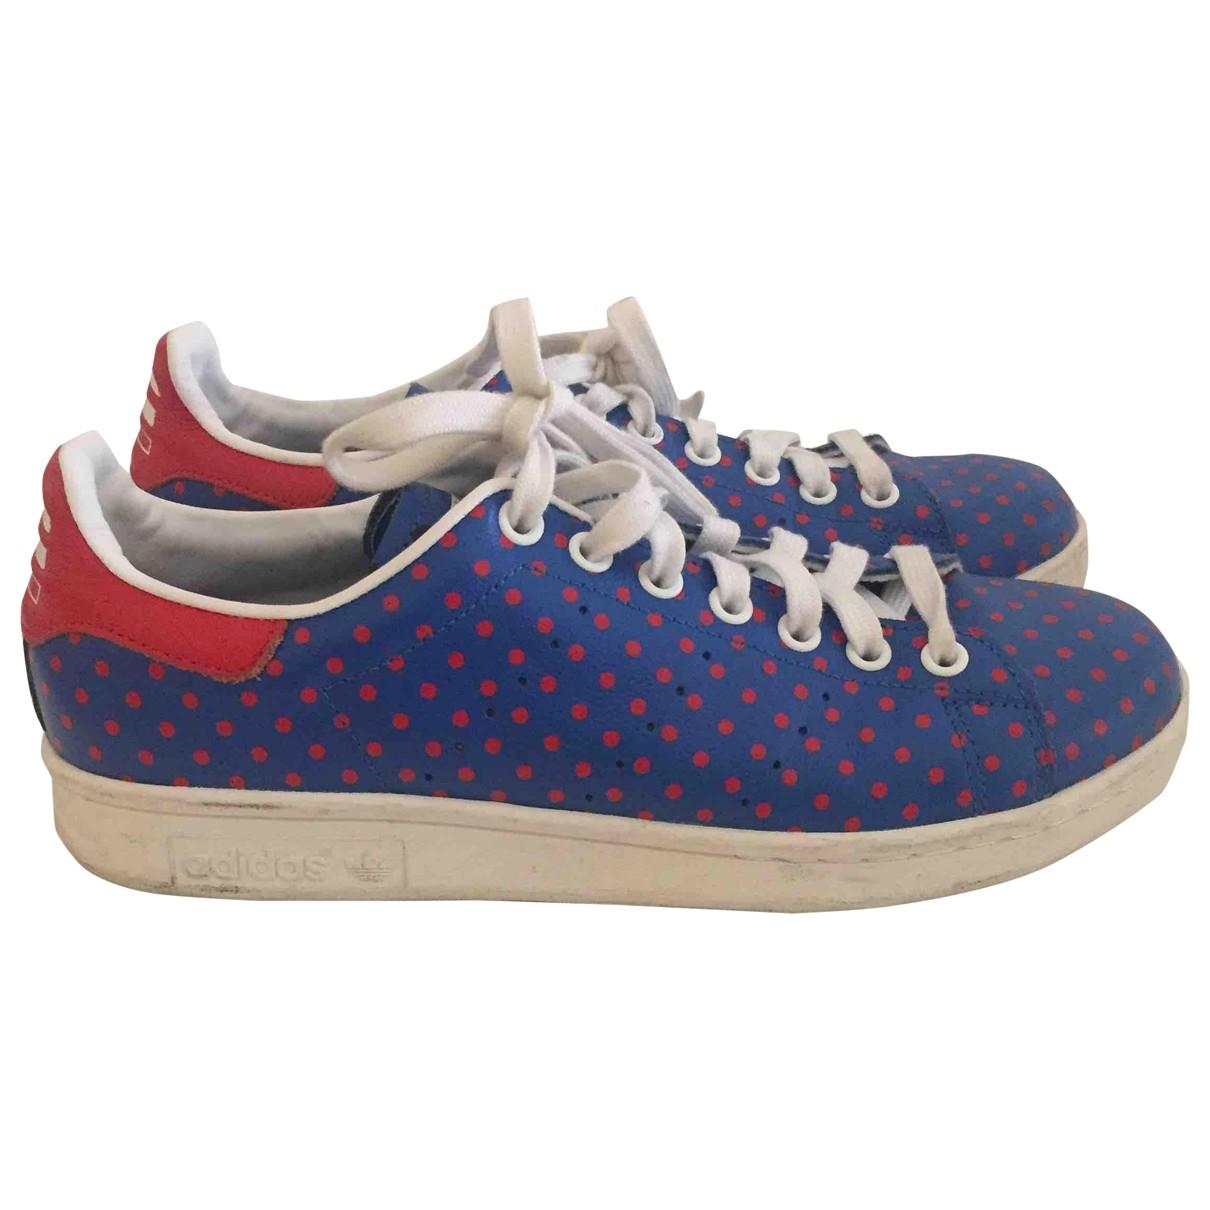 Adidas X Pharrell Williams \N Leather Trainers for Women 40.5 EU